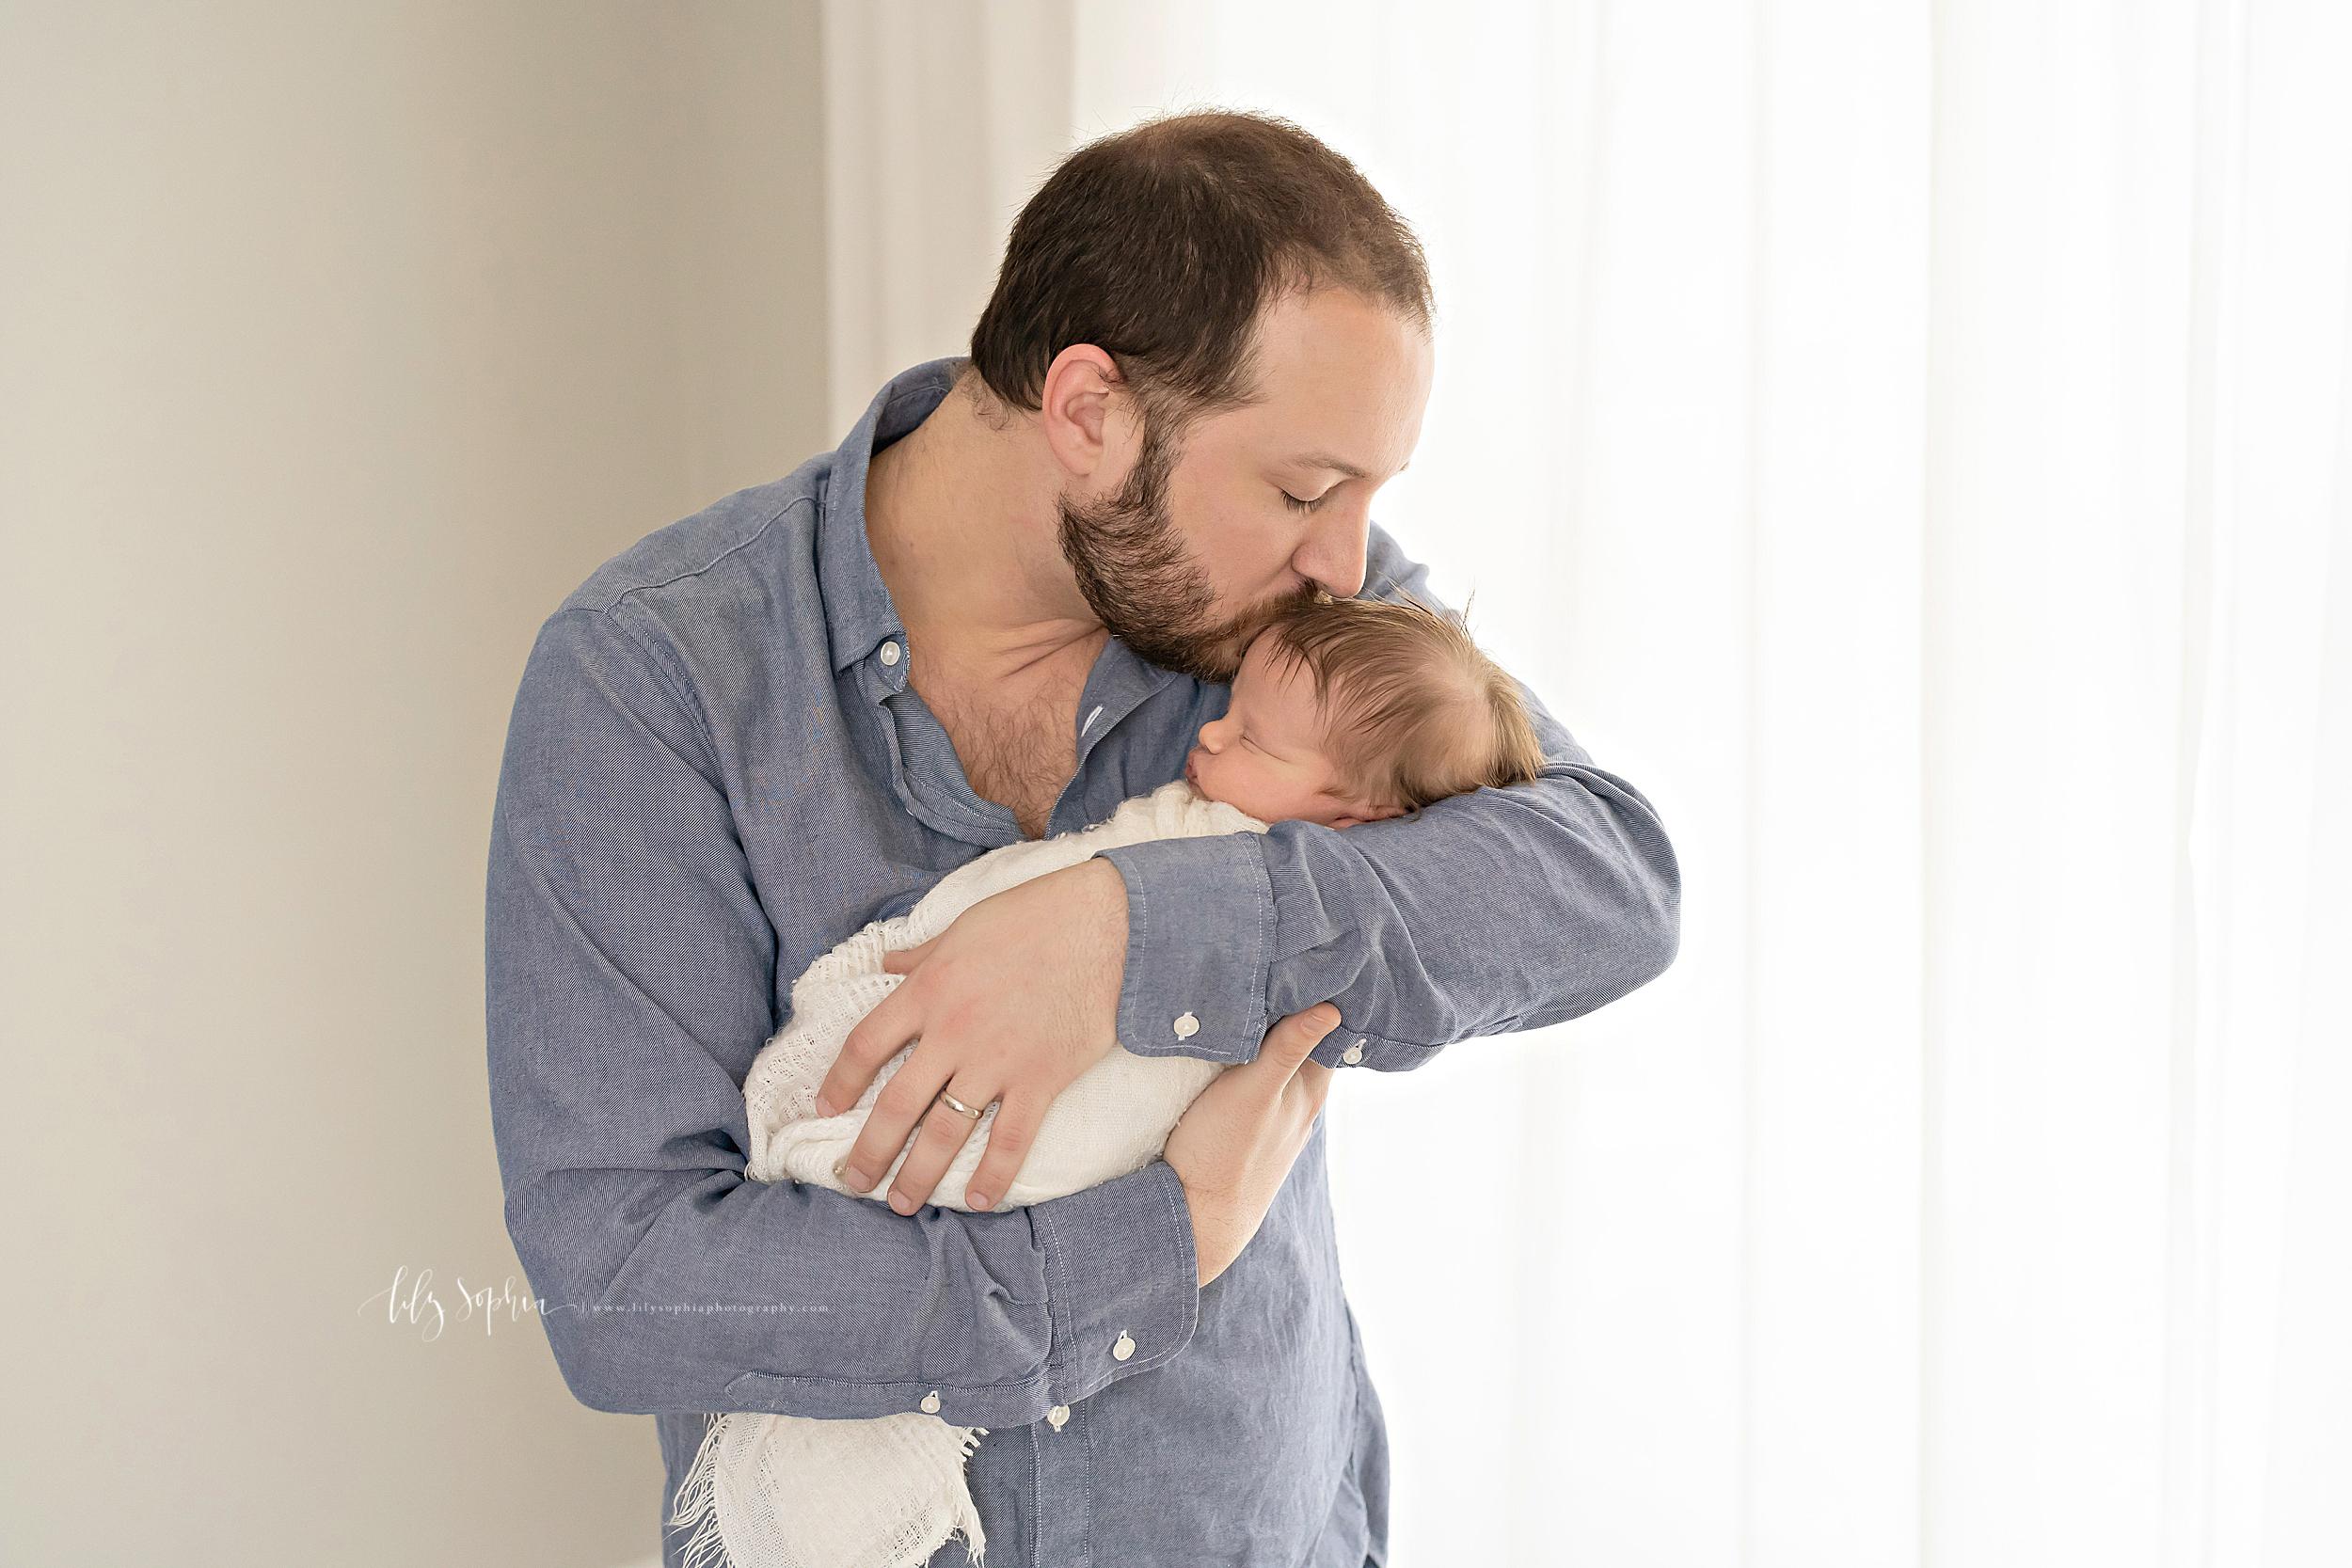 atlanta-midtown-brookhaven-ashford-dunwoody-virginia-highlands-roswell-decatur-lily-sophia-photography-newborn-baby-boy-big-brother-family-studio-session_0625.jpg